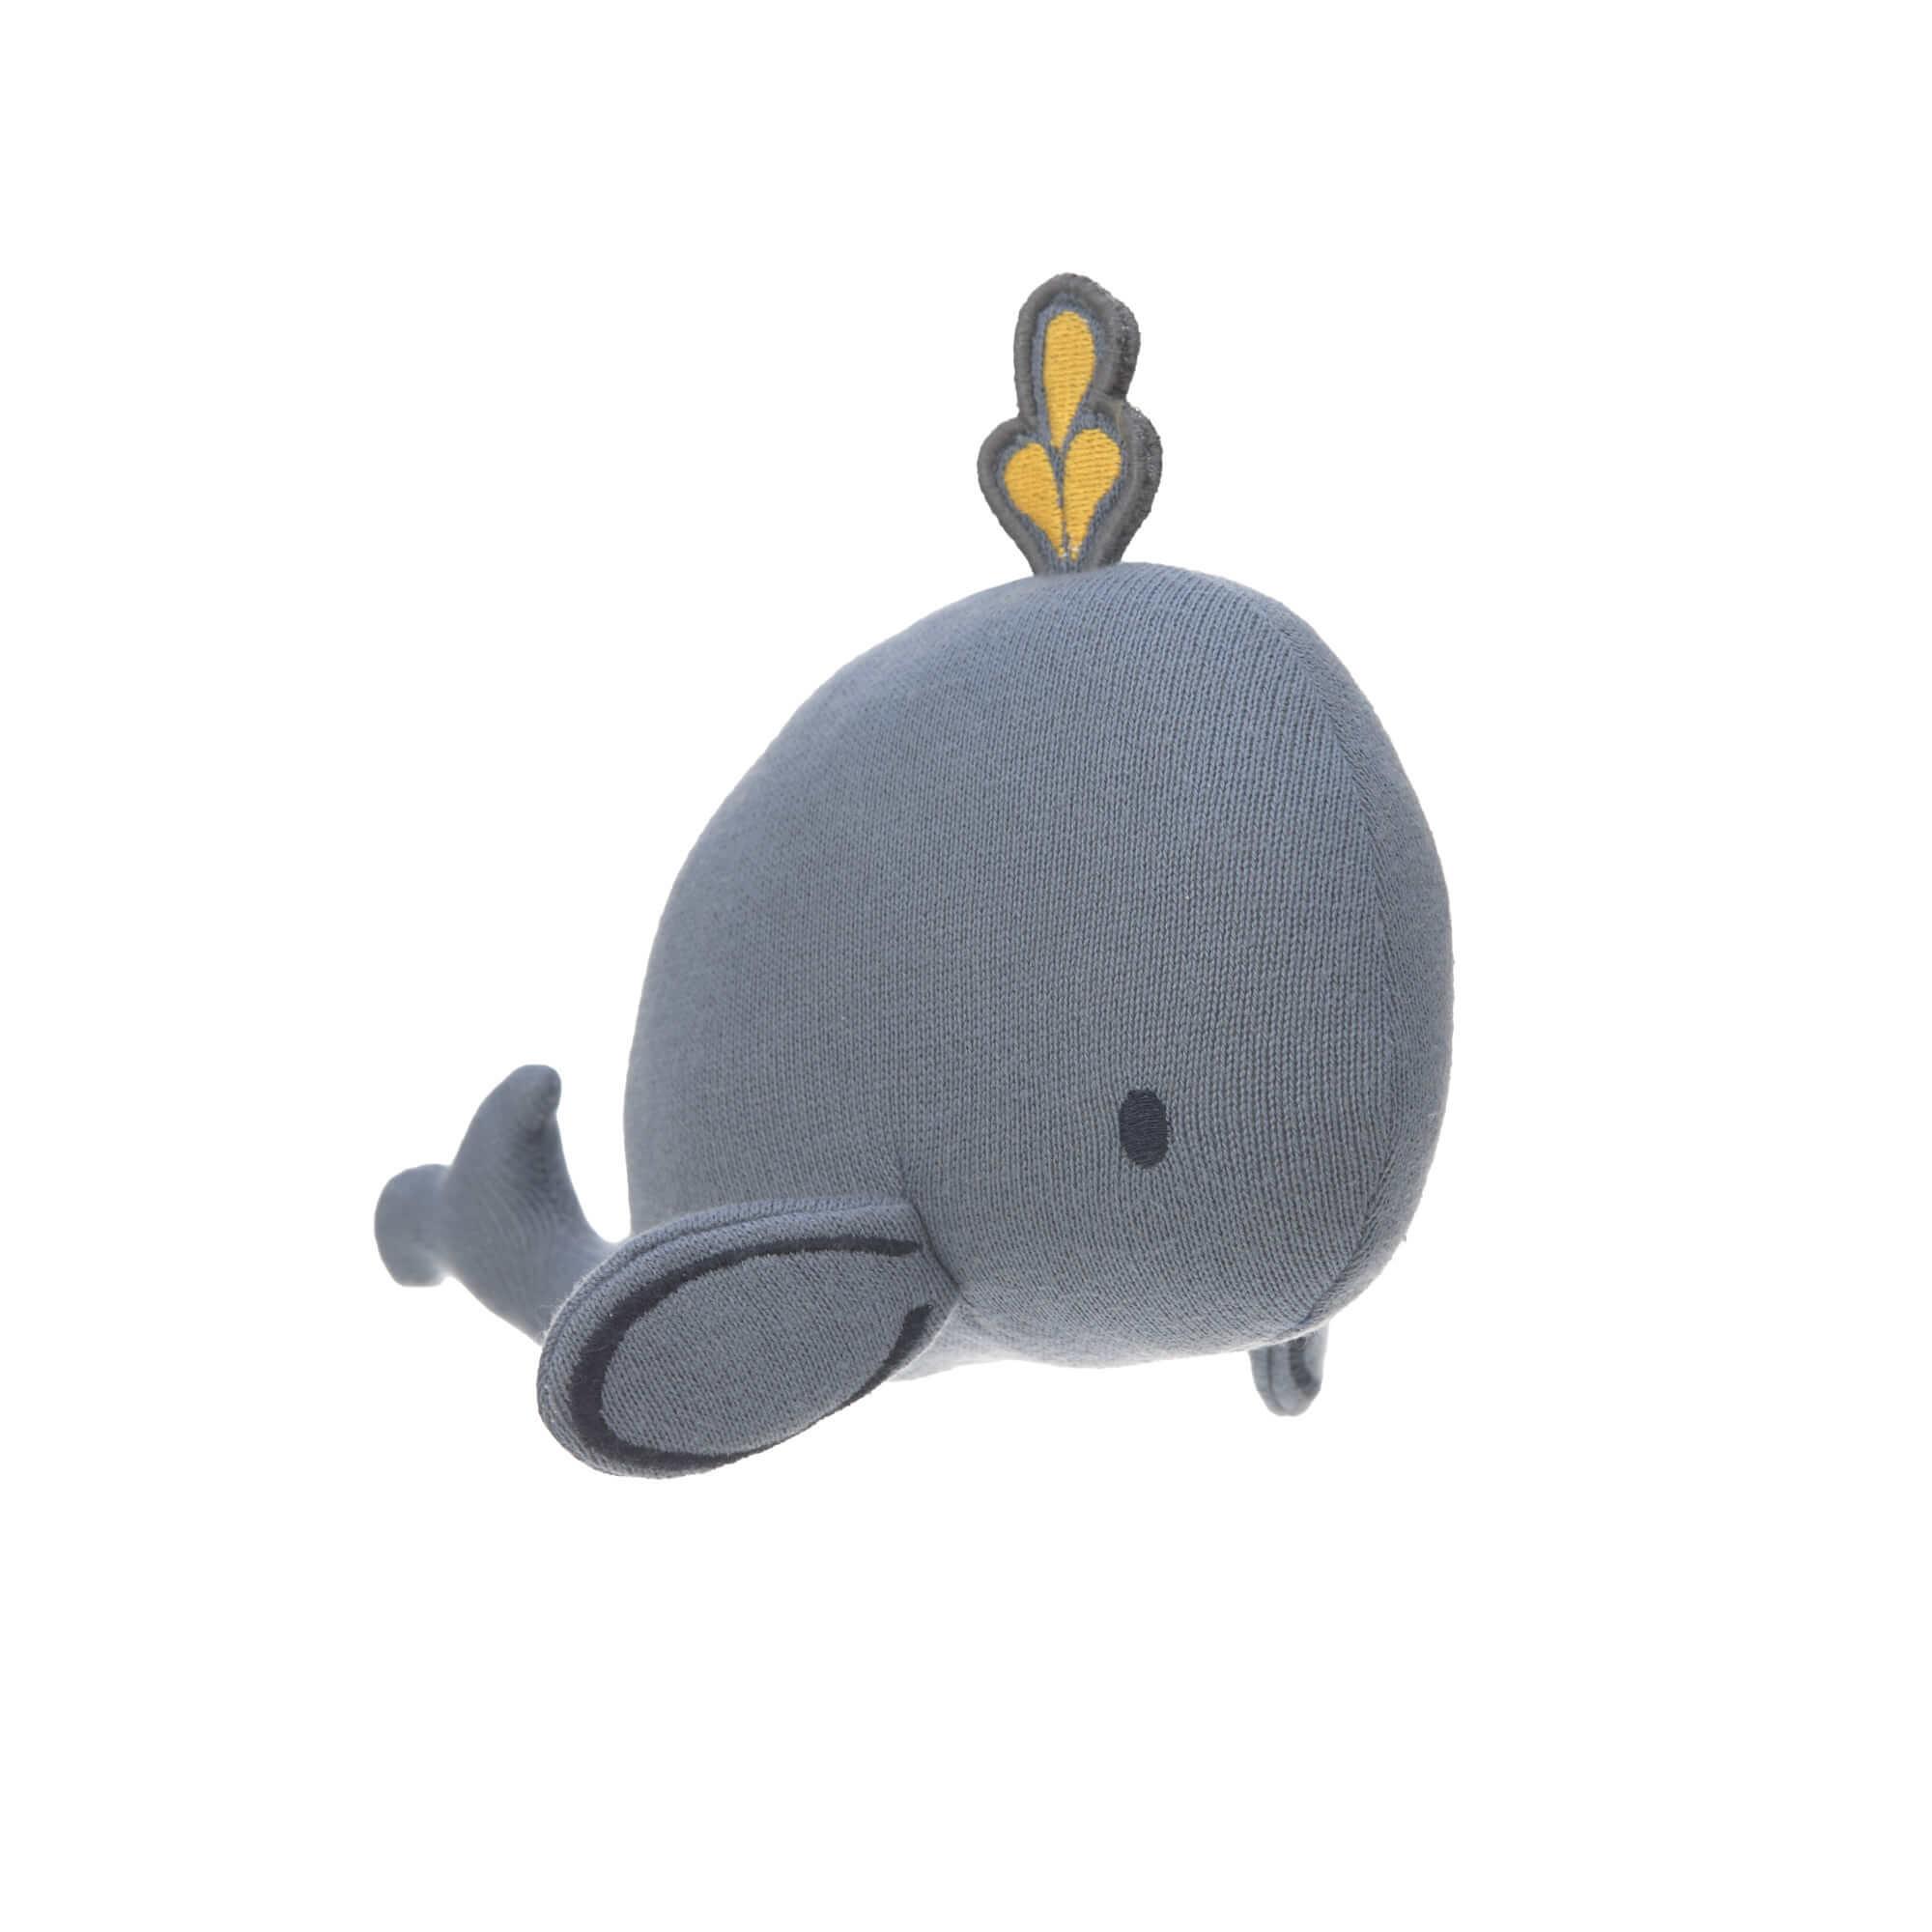 Lässig Lässig gebreid speeltje knuffel met rammelaar knetter Little Water Whale